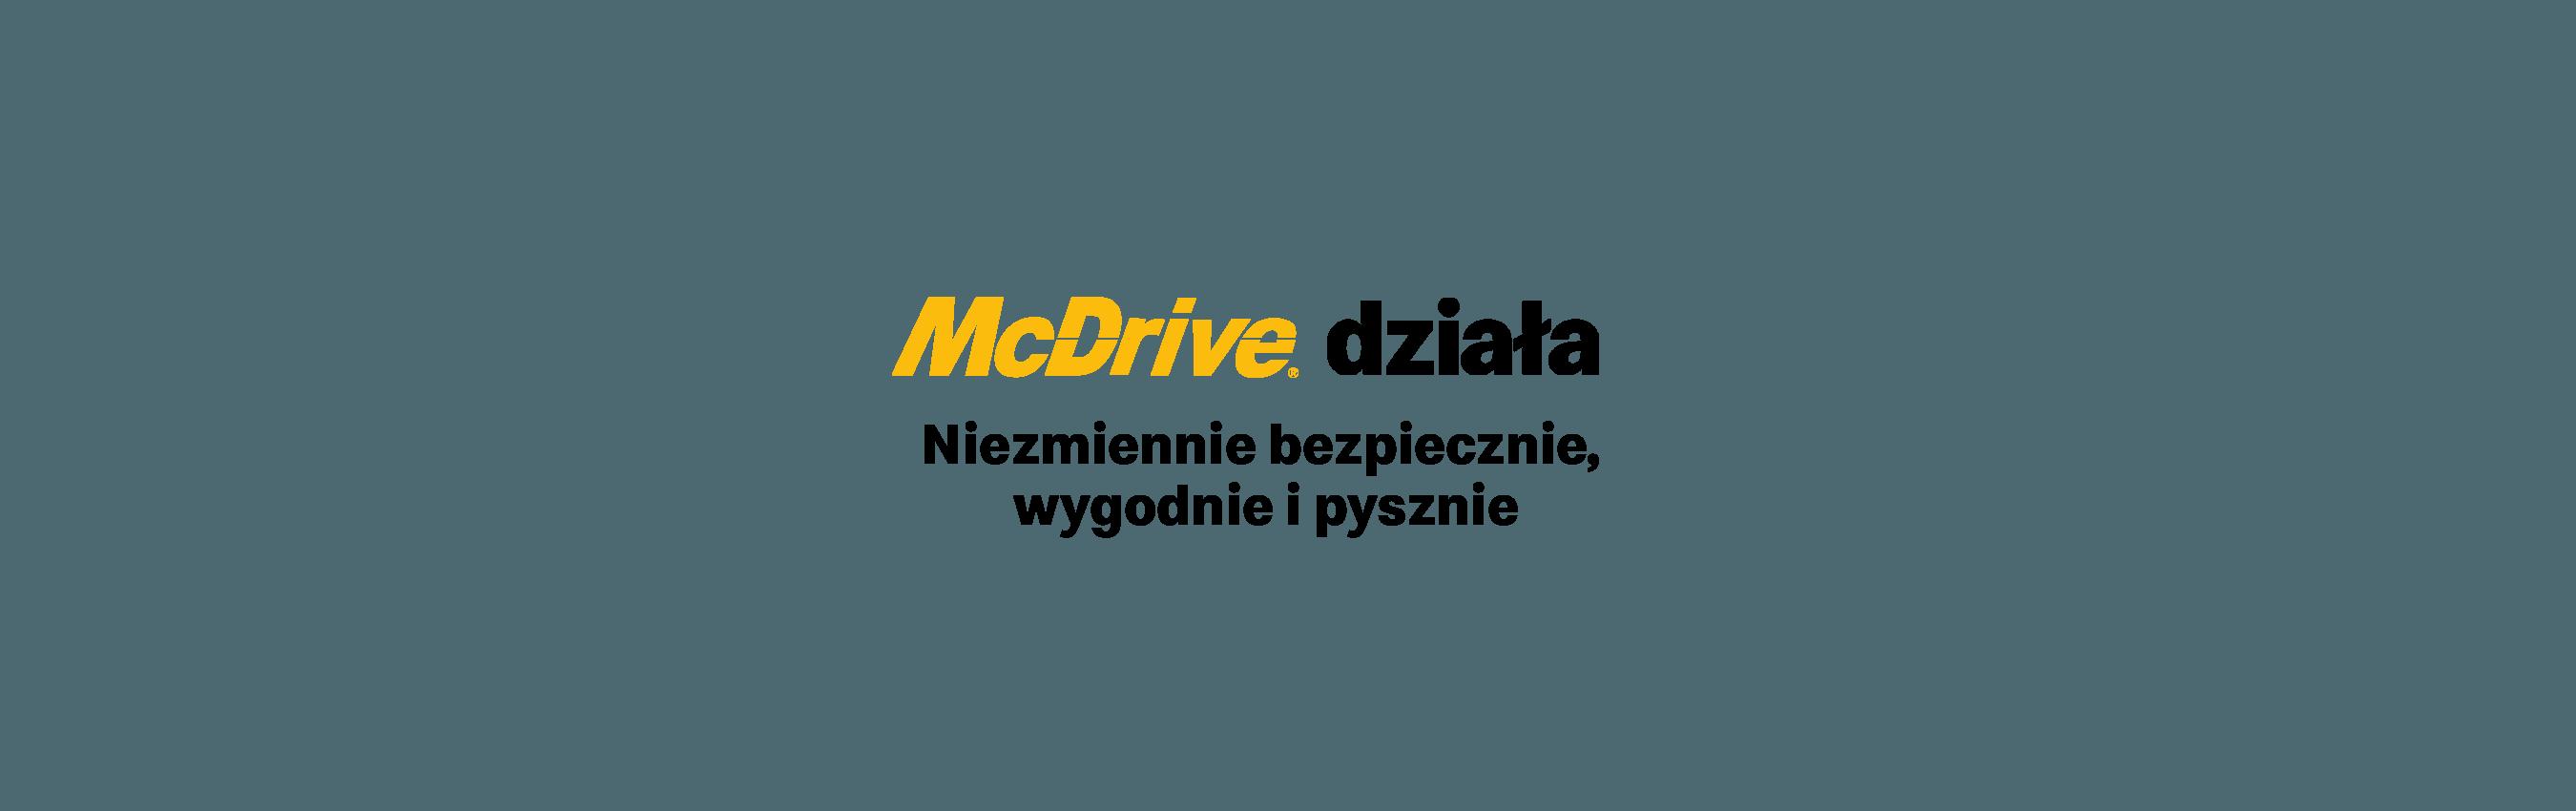 McDrive działa